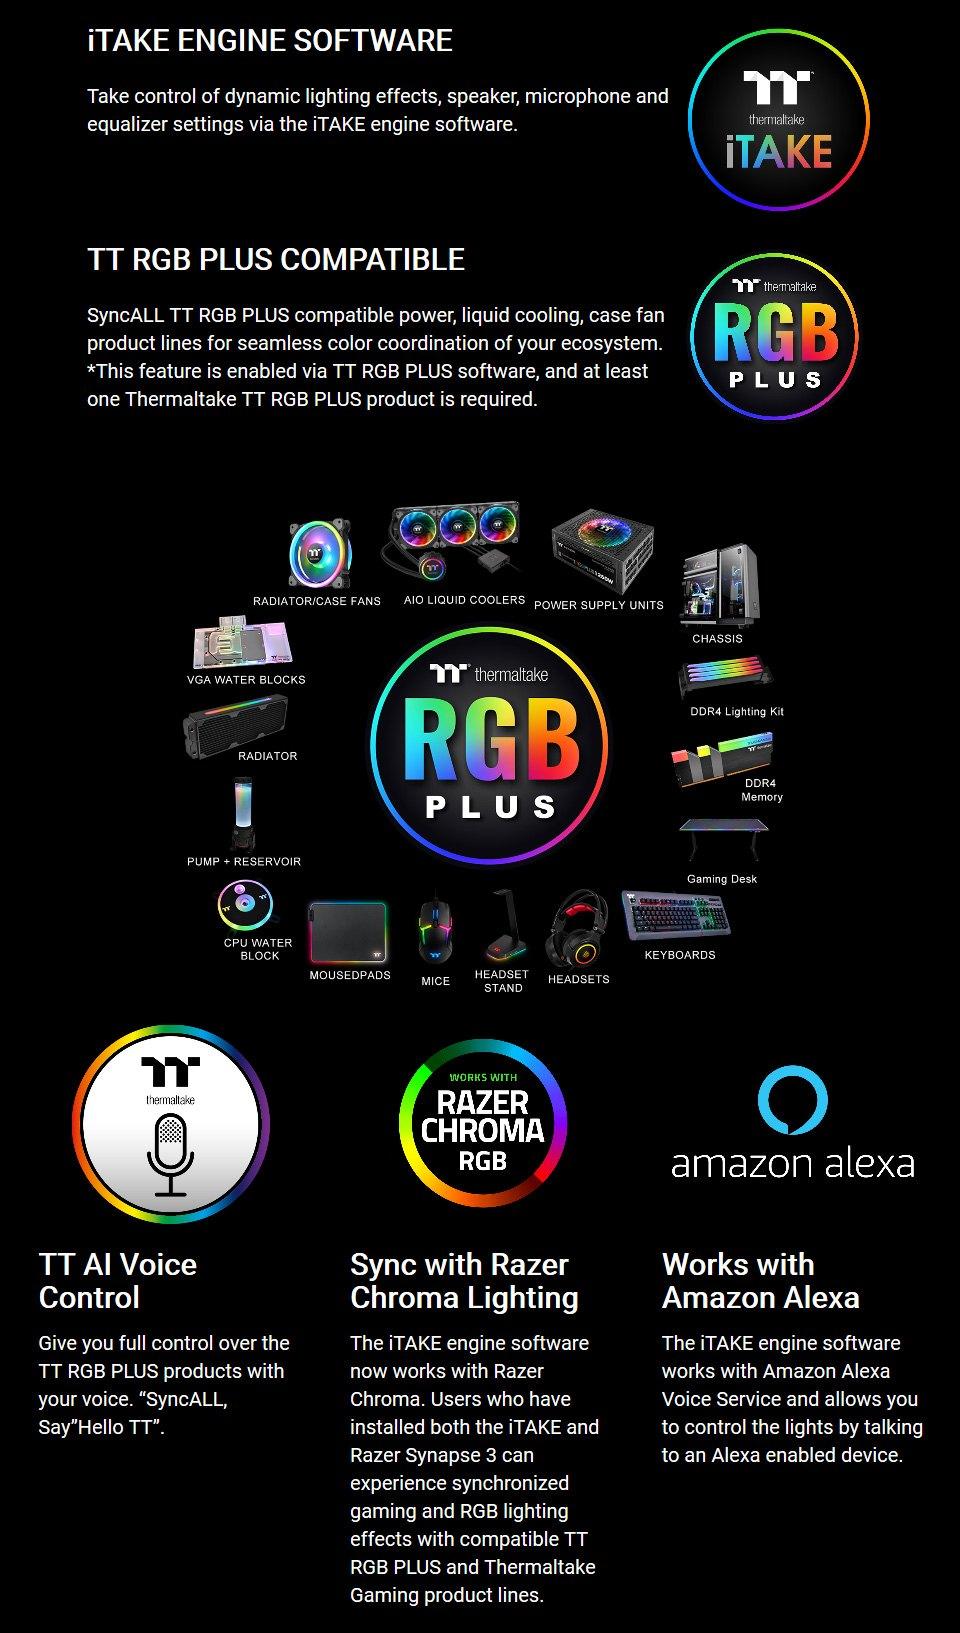 Thermaltake RIING Pro RGB 7.1 Surround Gaming Headset features 3